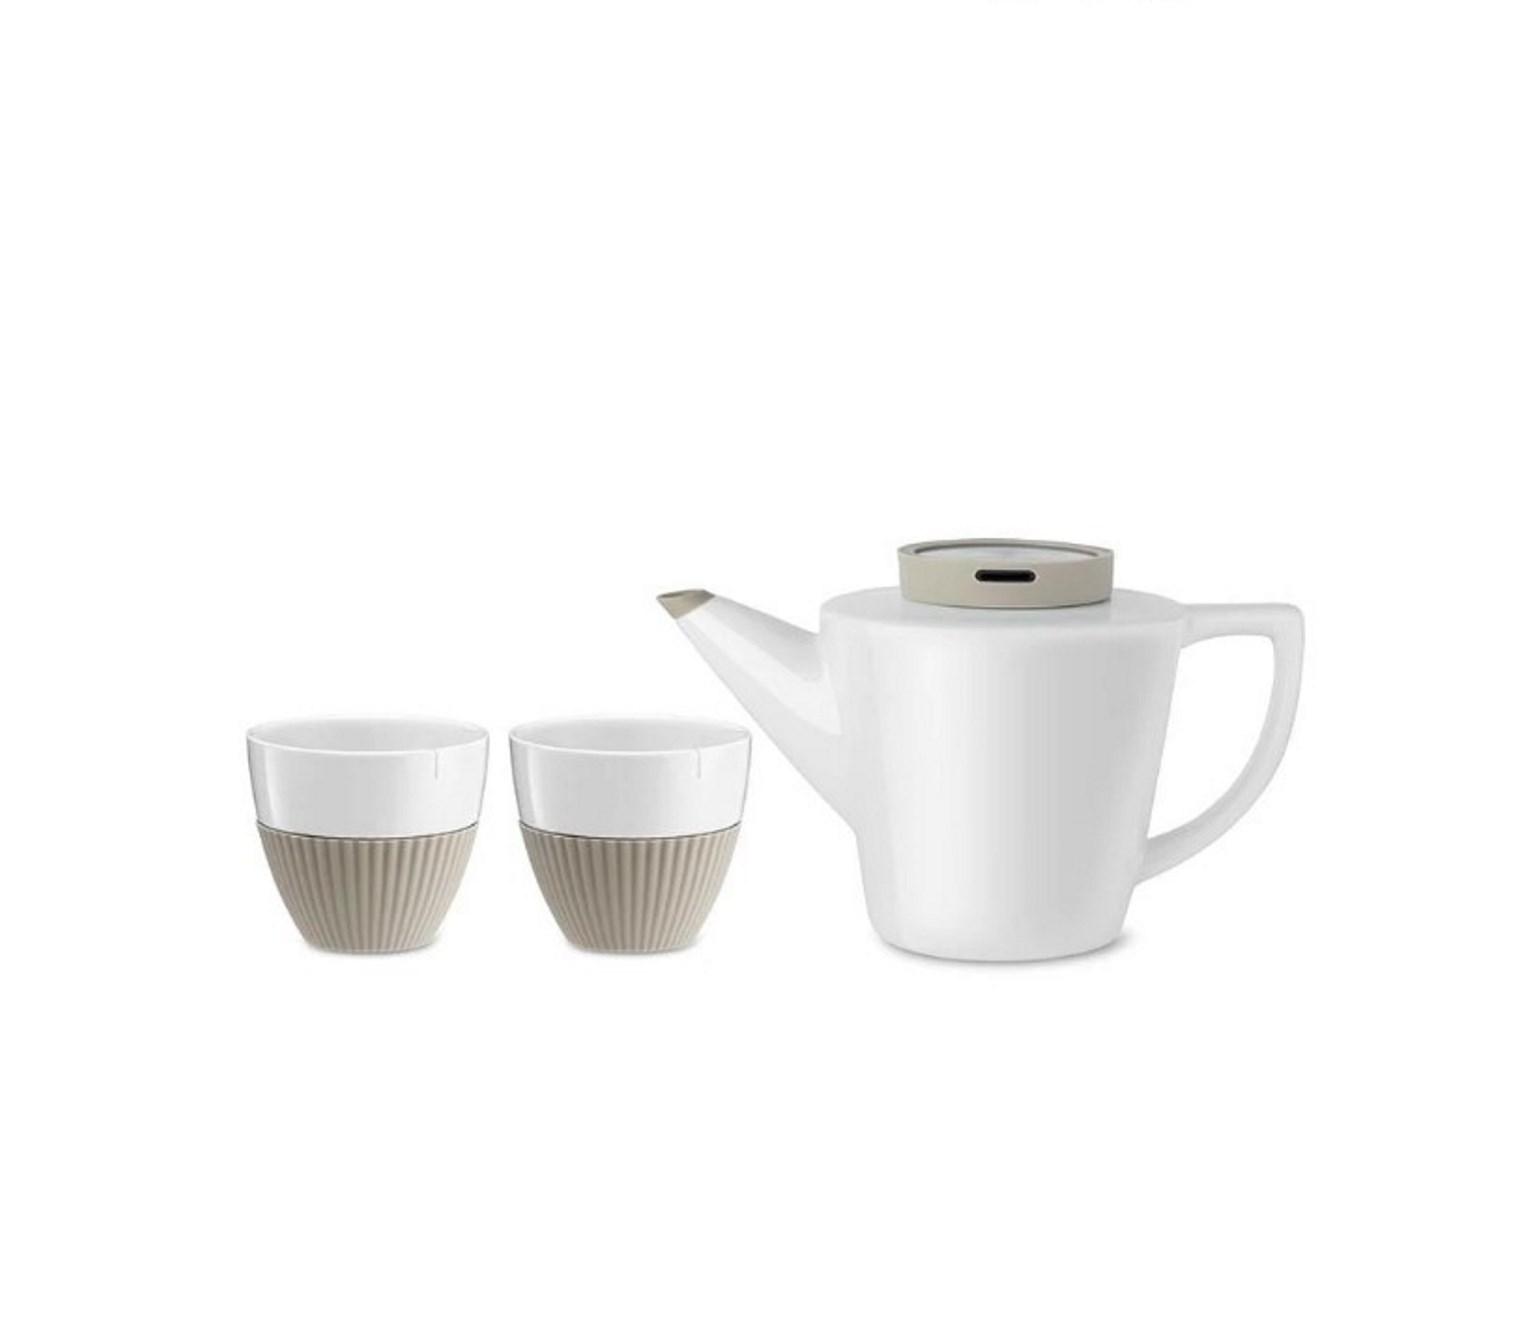 Набор для чая (чайник 22,8х13,3х13,4 см и 2 чашки 8,5х9,4 см) Viva Scandinavia INFUSION, бежевый, 3 предмета купить украина